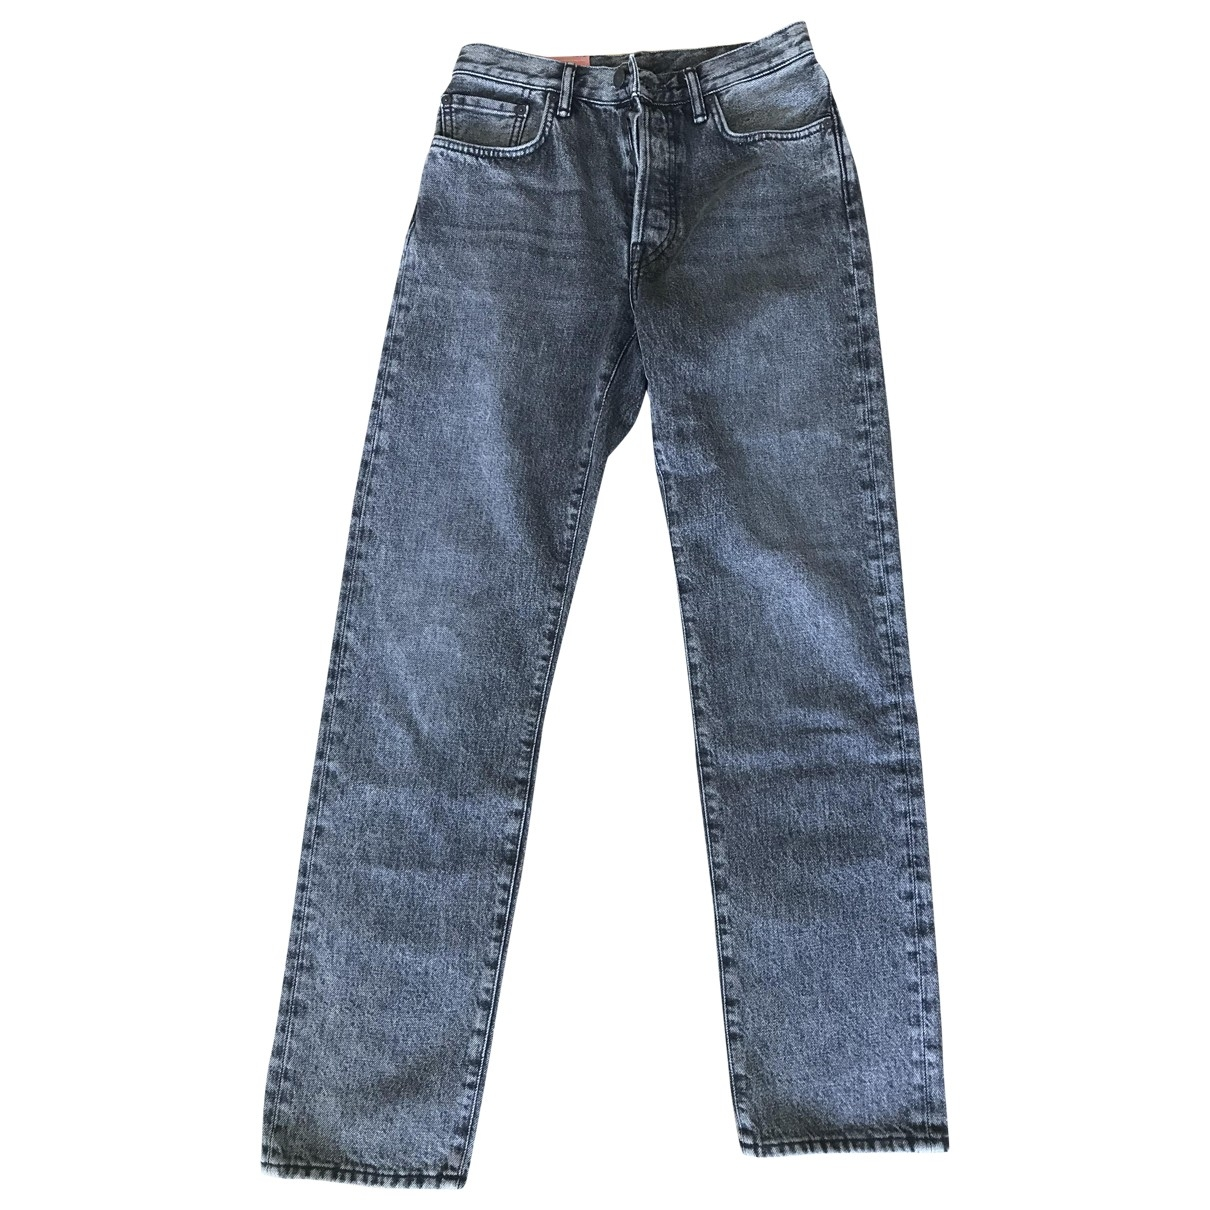 Acne Studios Blå Konst Grey Cotton Jeans for Women 29 US